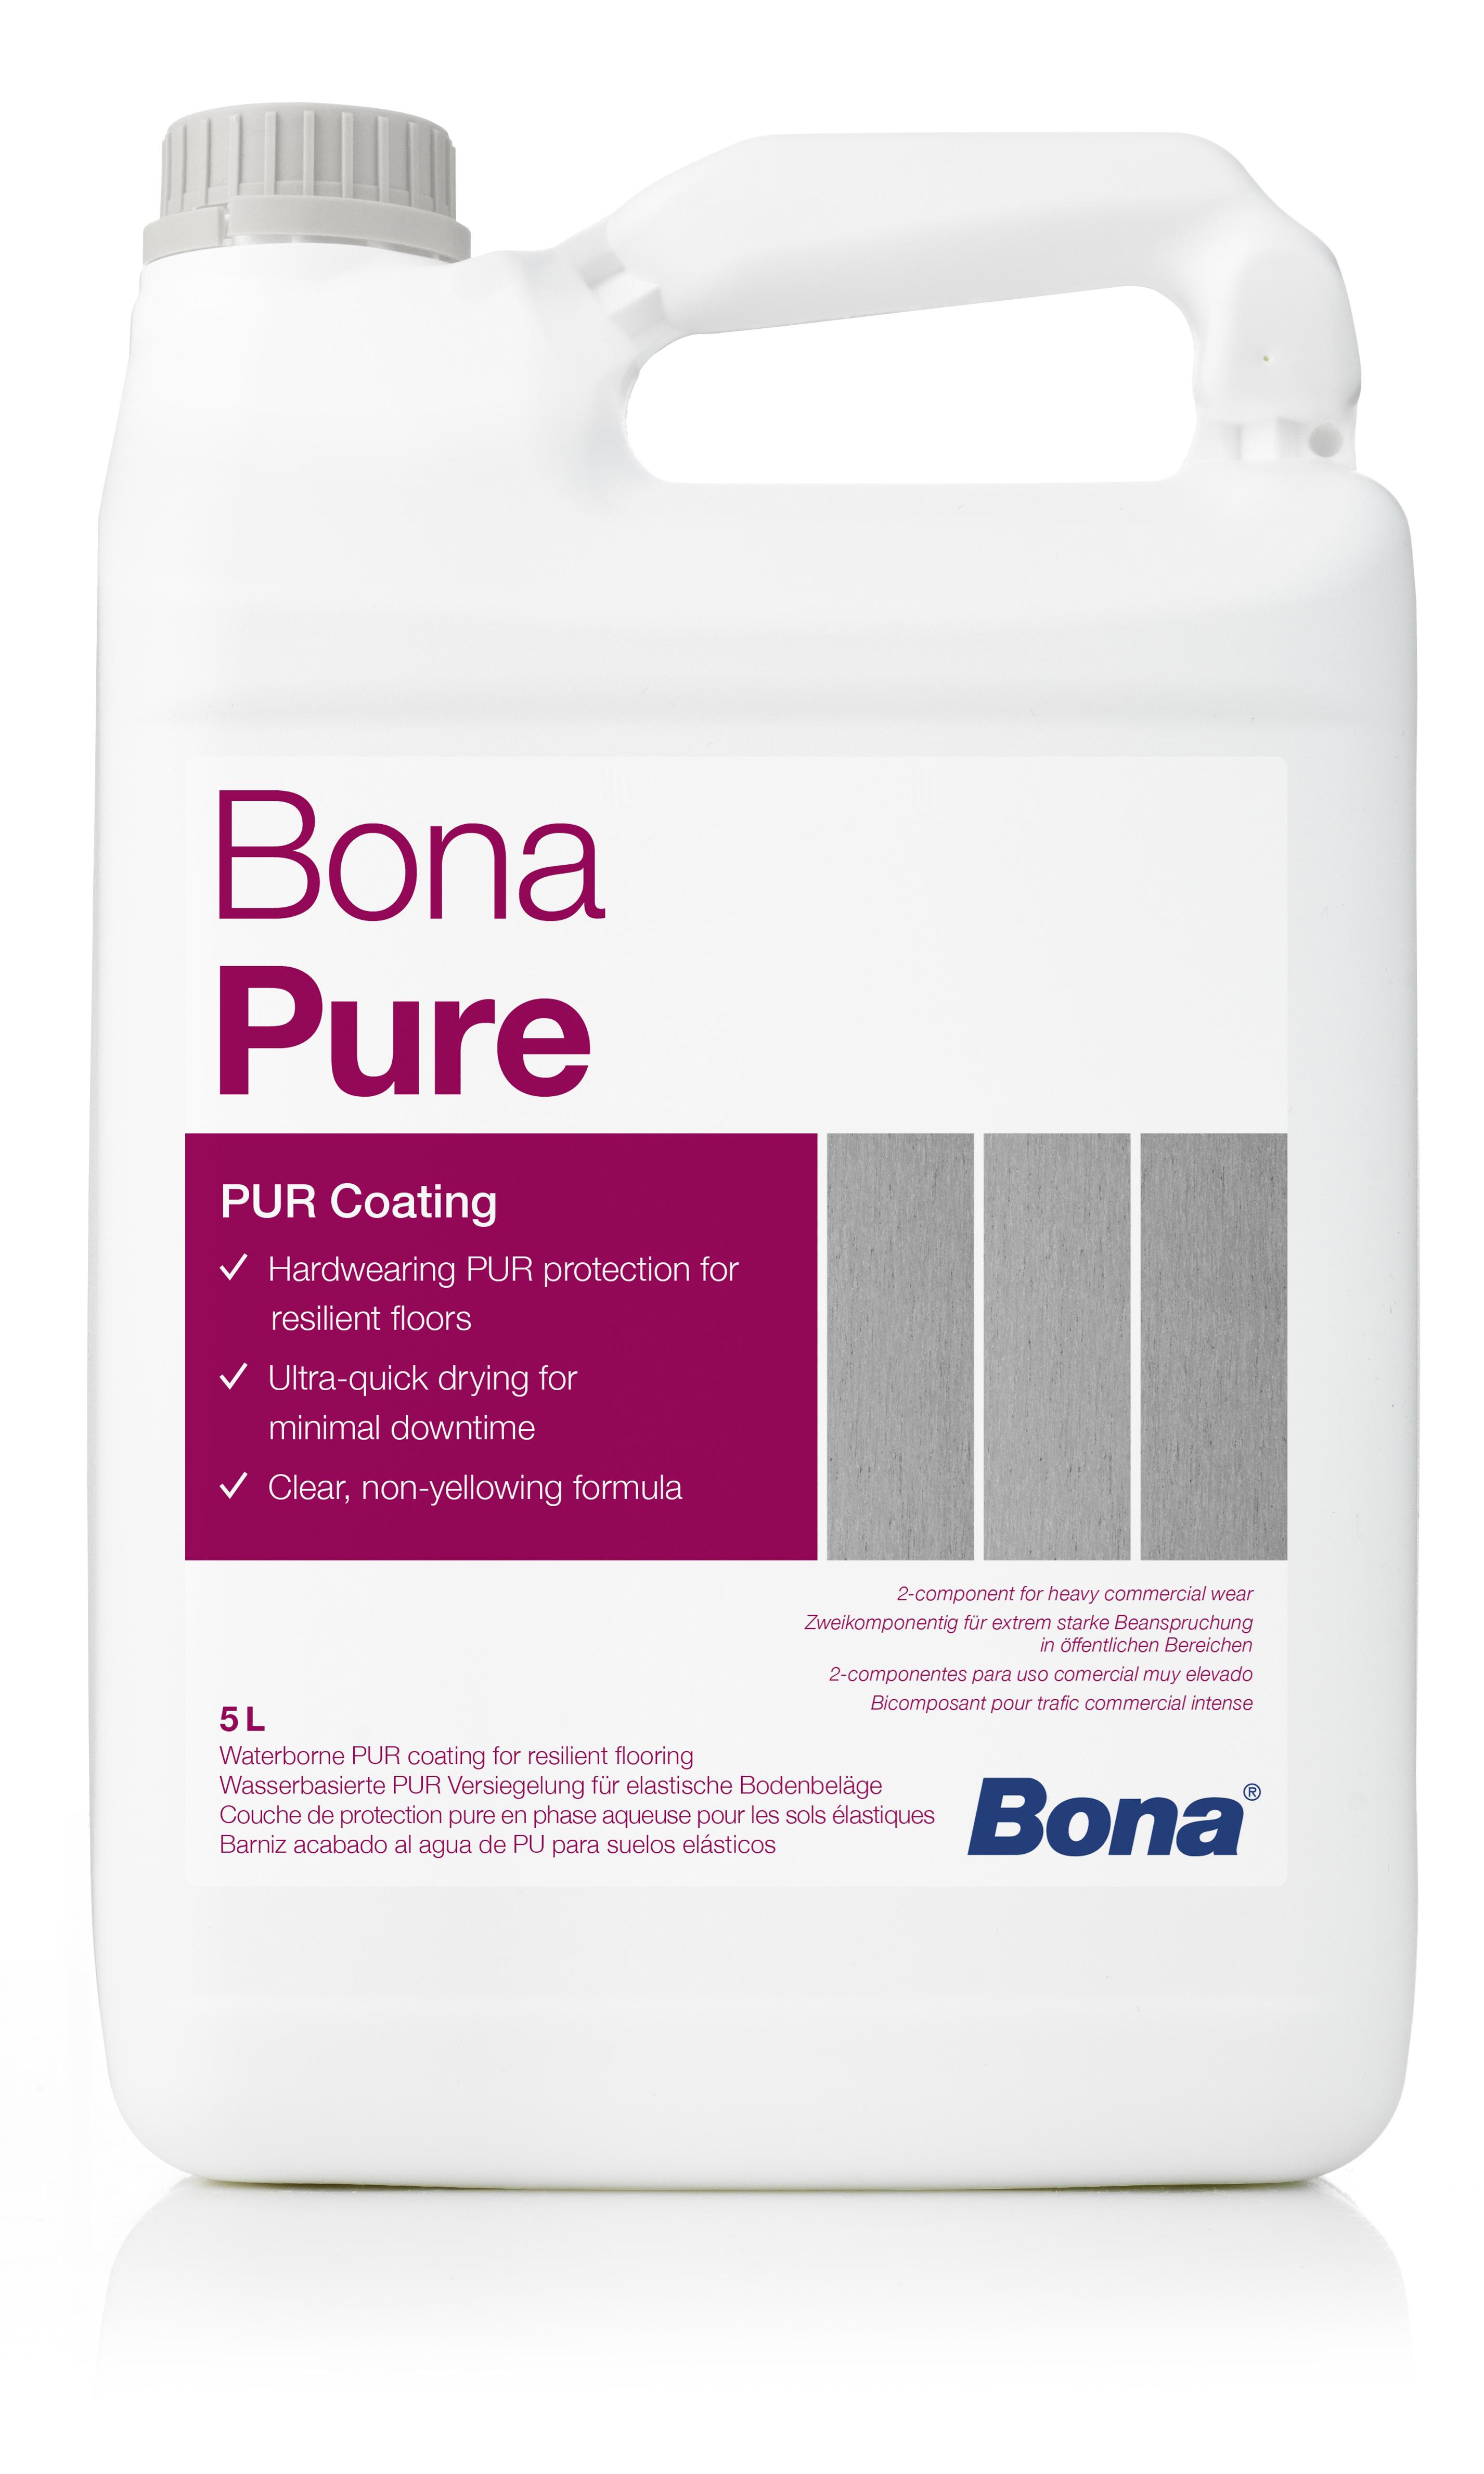 Bona Pure